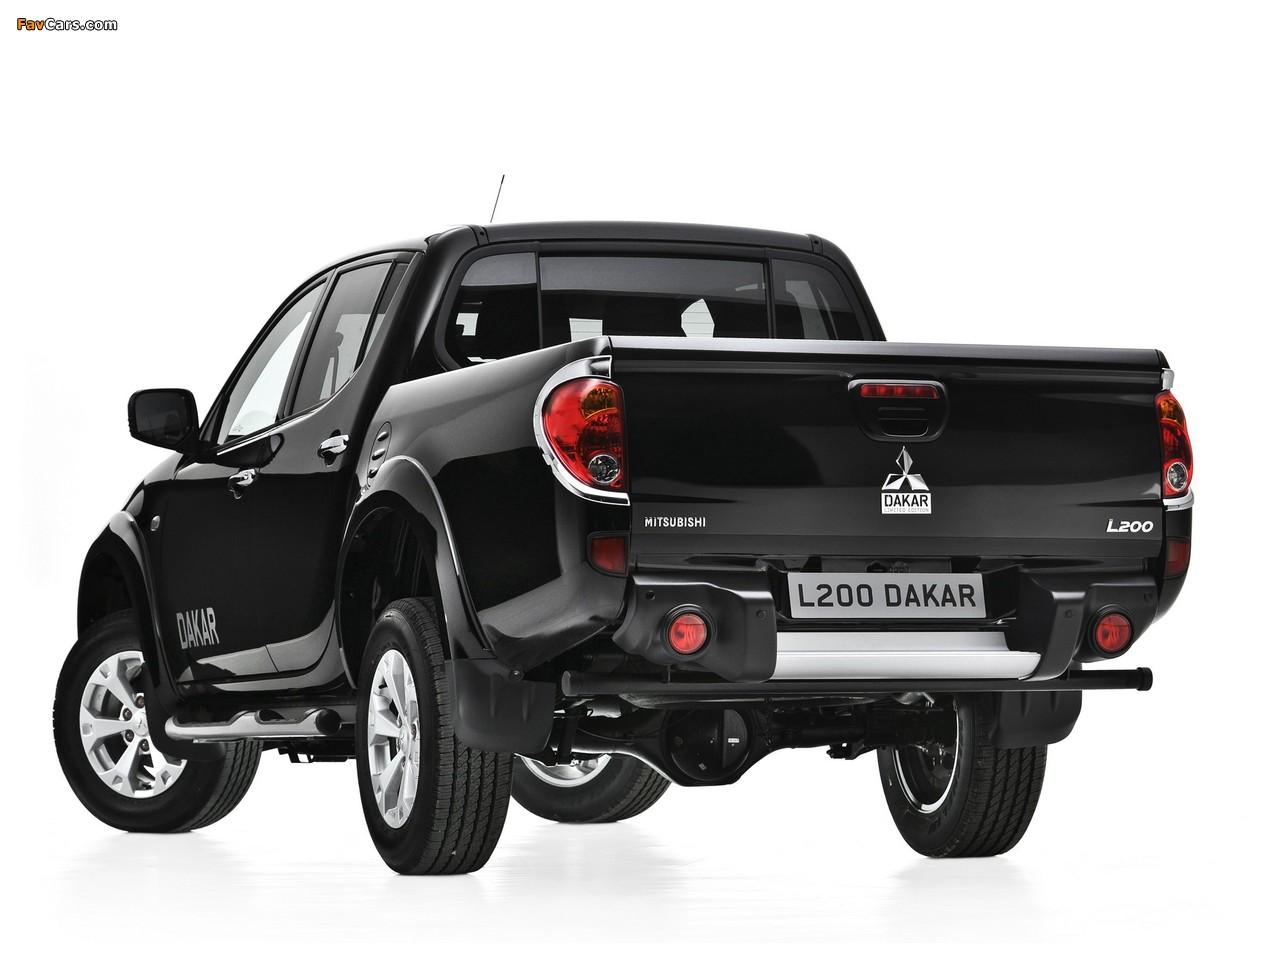 Mitsubishi L200 Dakar 2012 images (1280 x 960)